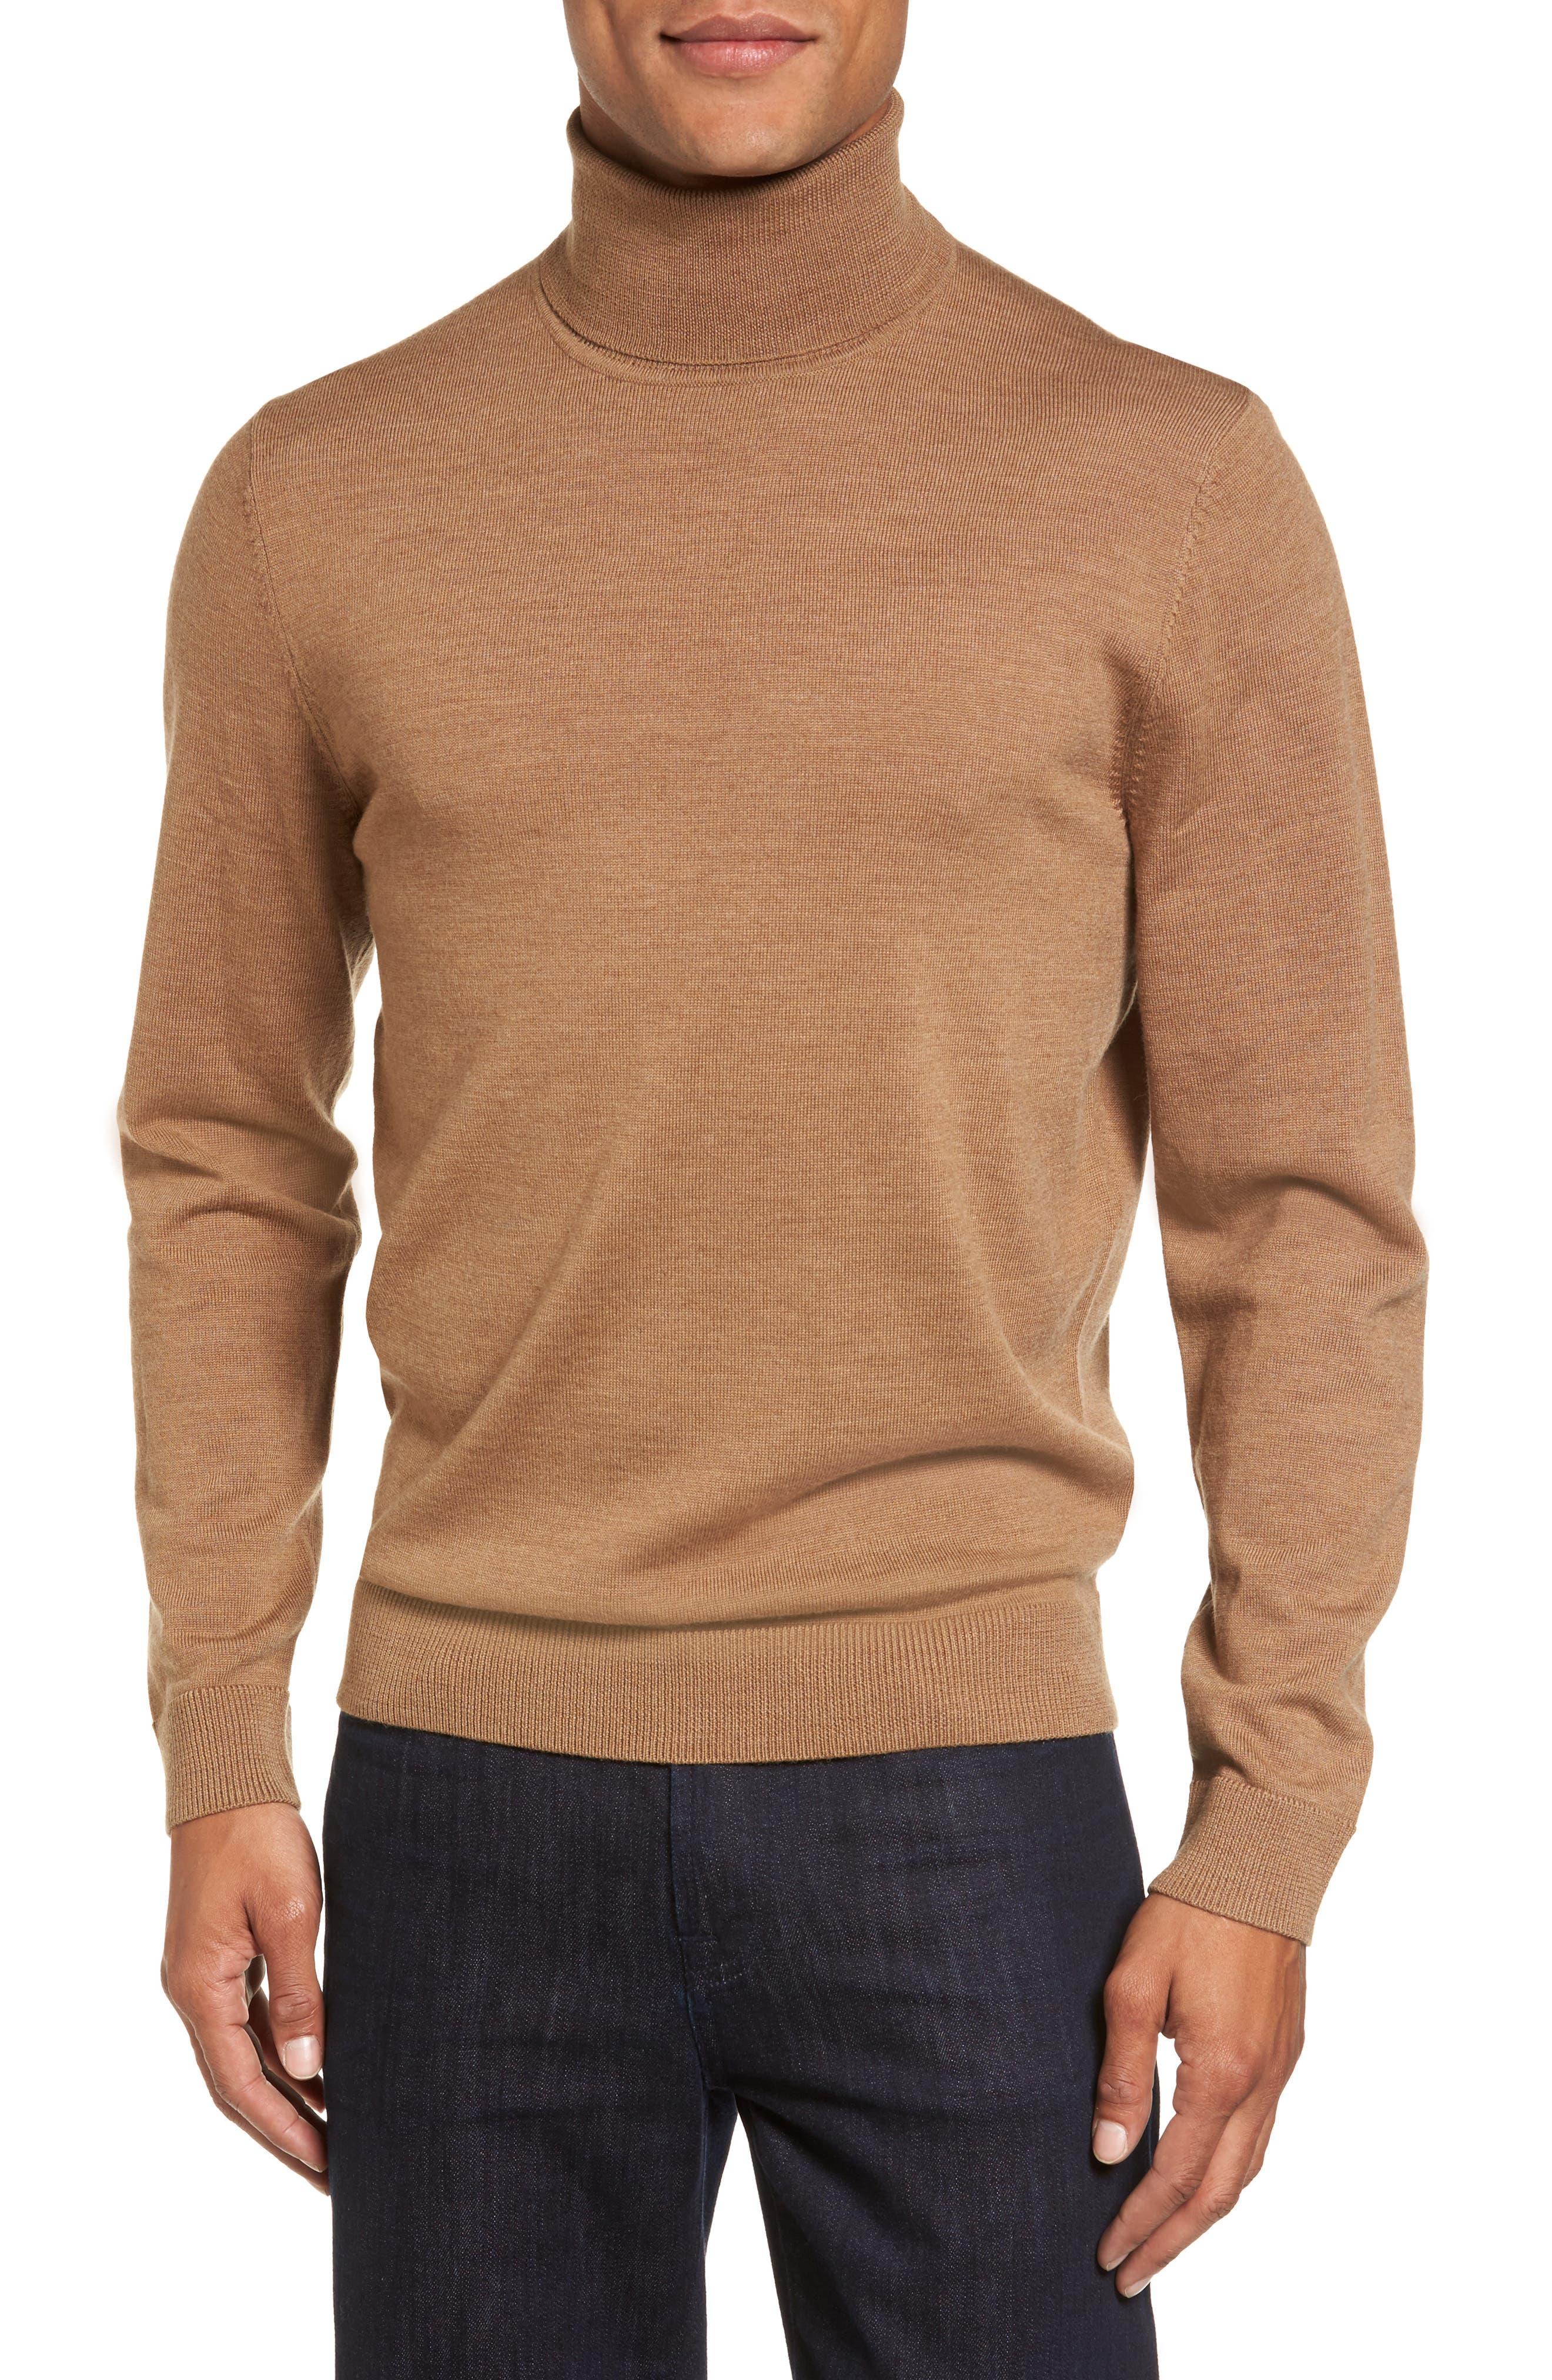 Nordstrom Shop Merino Wool Turtleneck Sweater